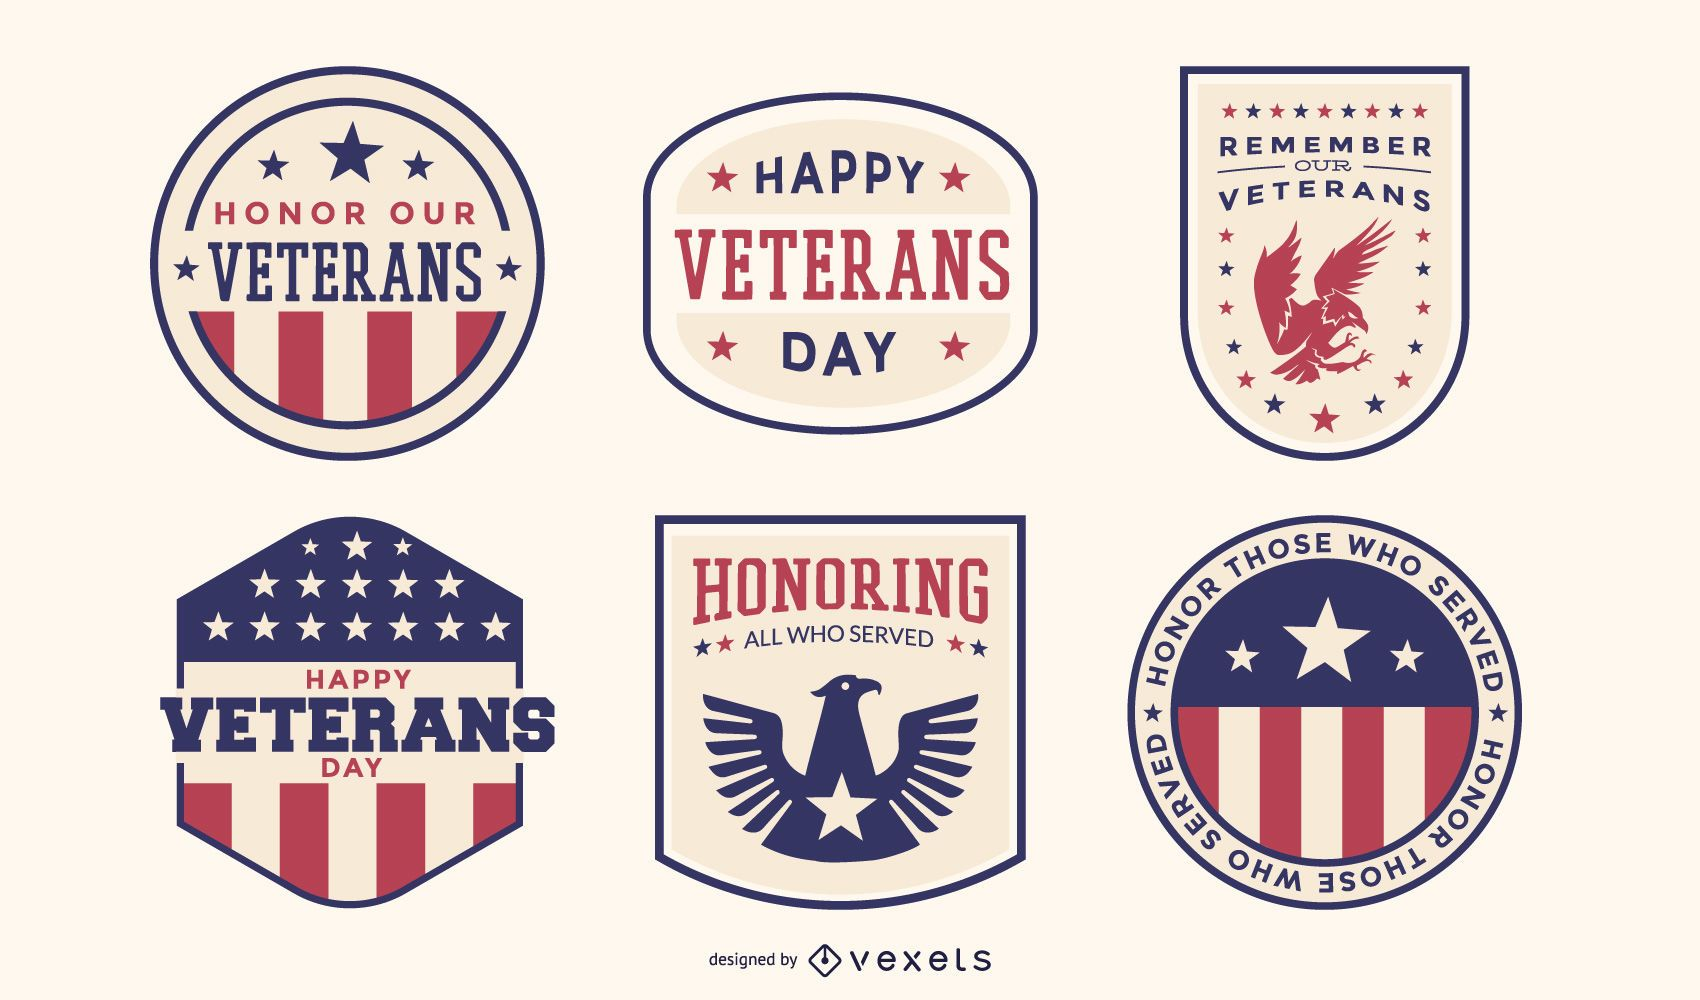 Pacote de crachás do dia dos veteranos